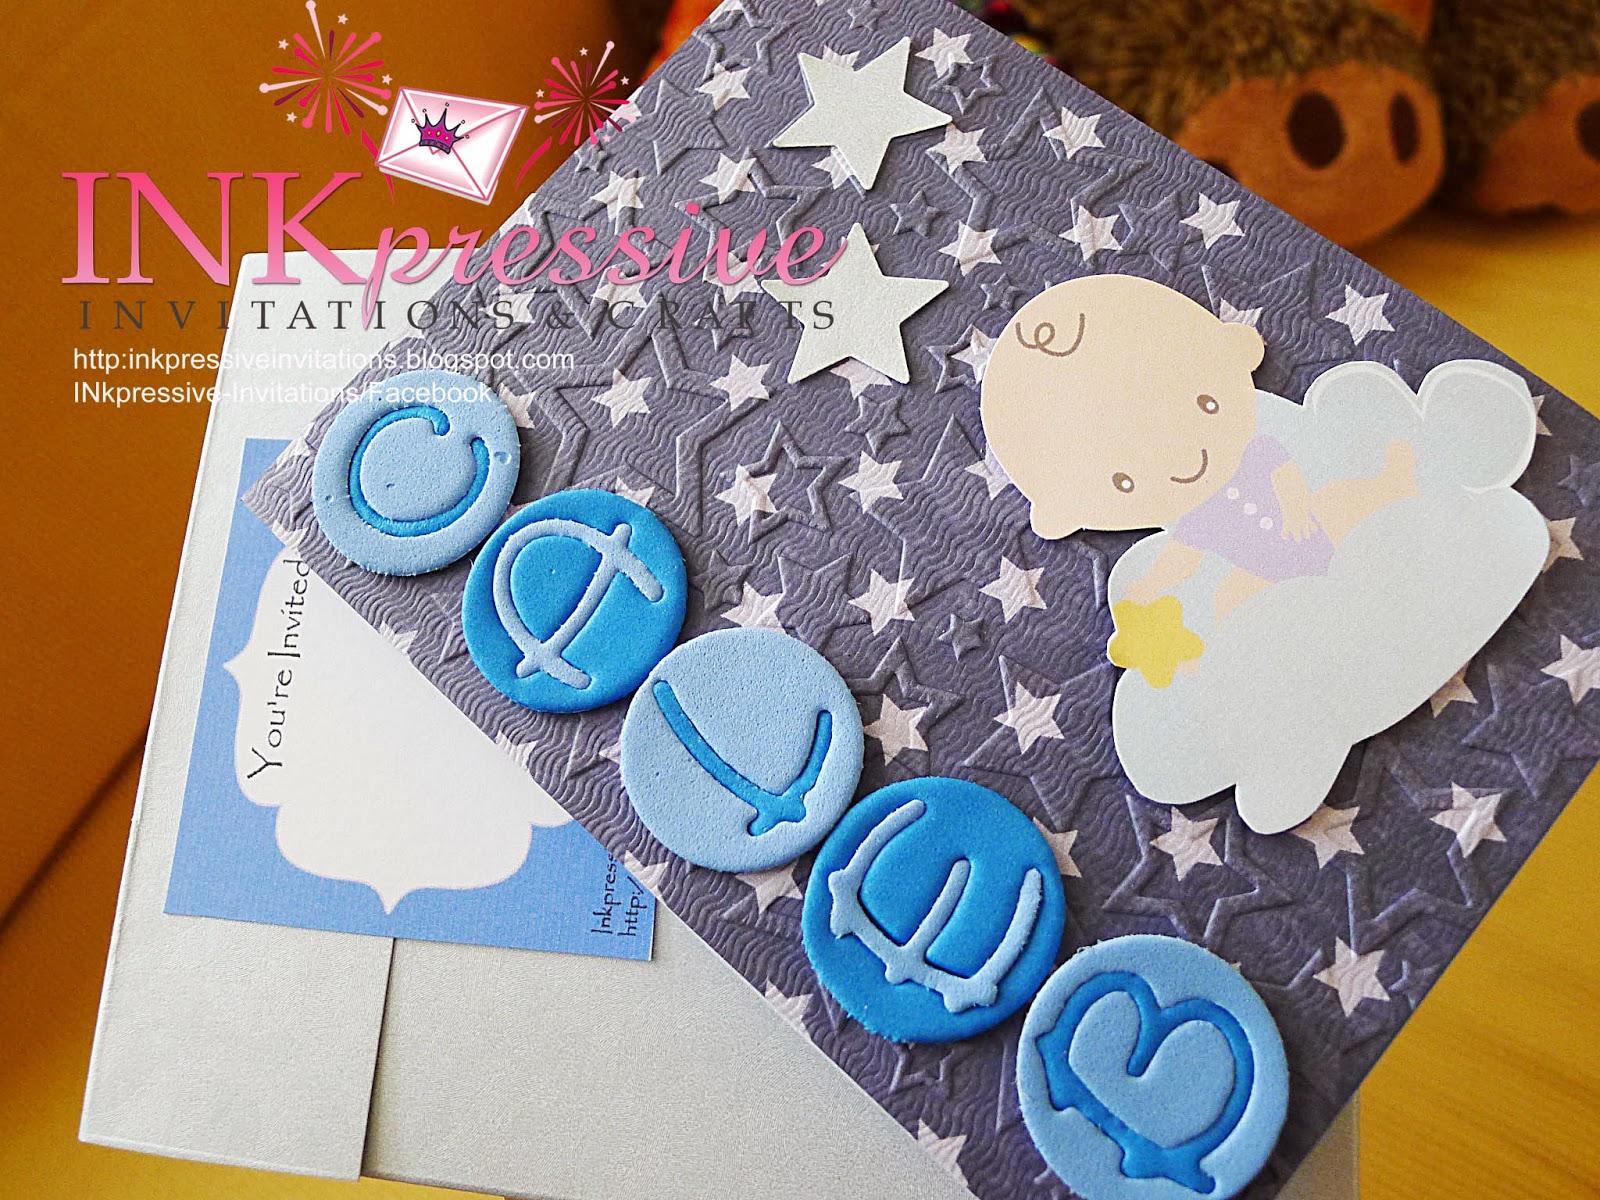 Embossed Background, Die Cut Alphabets, Die Cut Baby Image And Stars